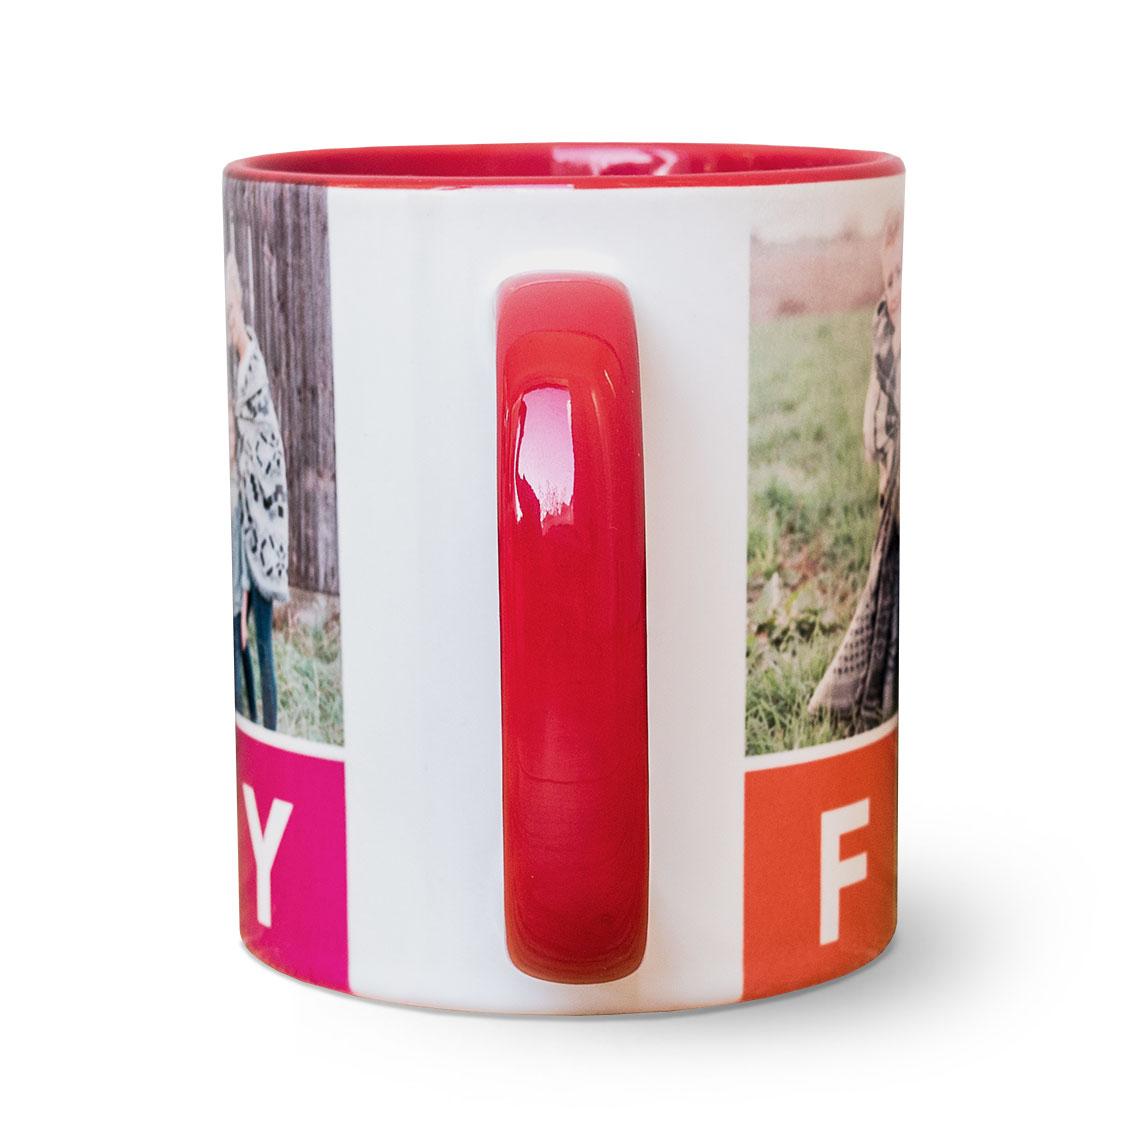 Red Coffee Mug 11oz   11oz Coloured Mugs   Mugs   Gifts   Snapfish UK